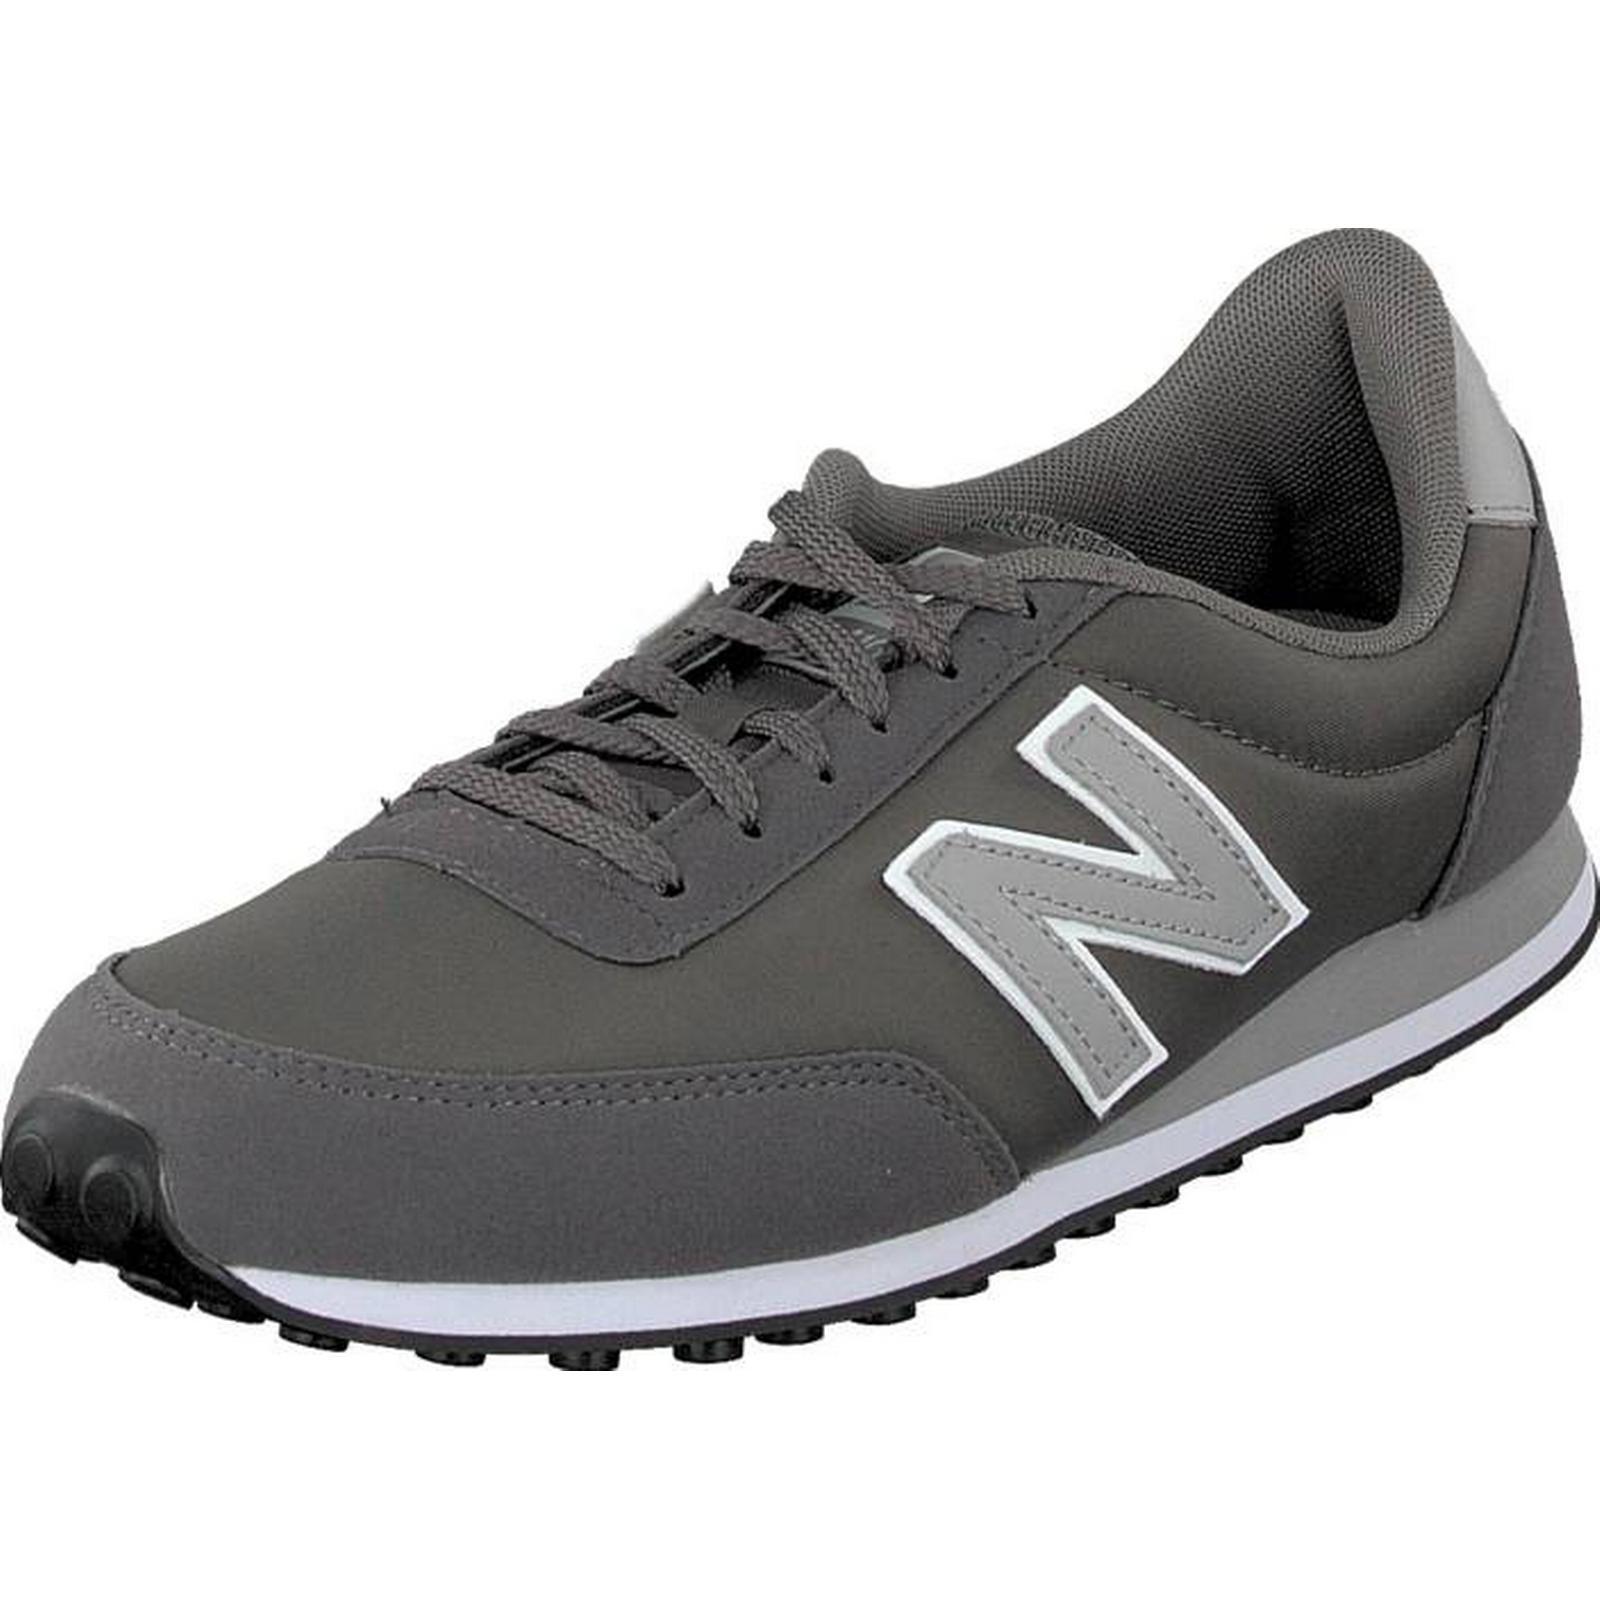 New Balance U410CA Grey, Shoes, Trainers Sport & Sport Trainers Shoes , Trainers, Grey, Unisex, 36 74e486